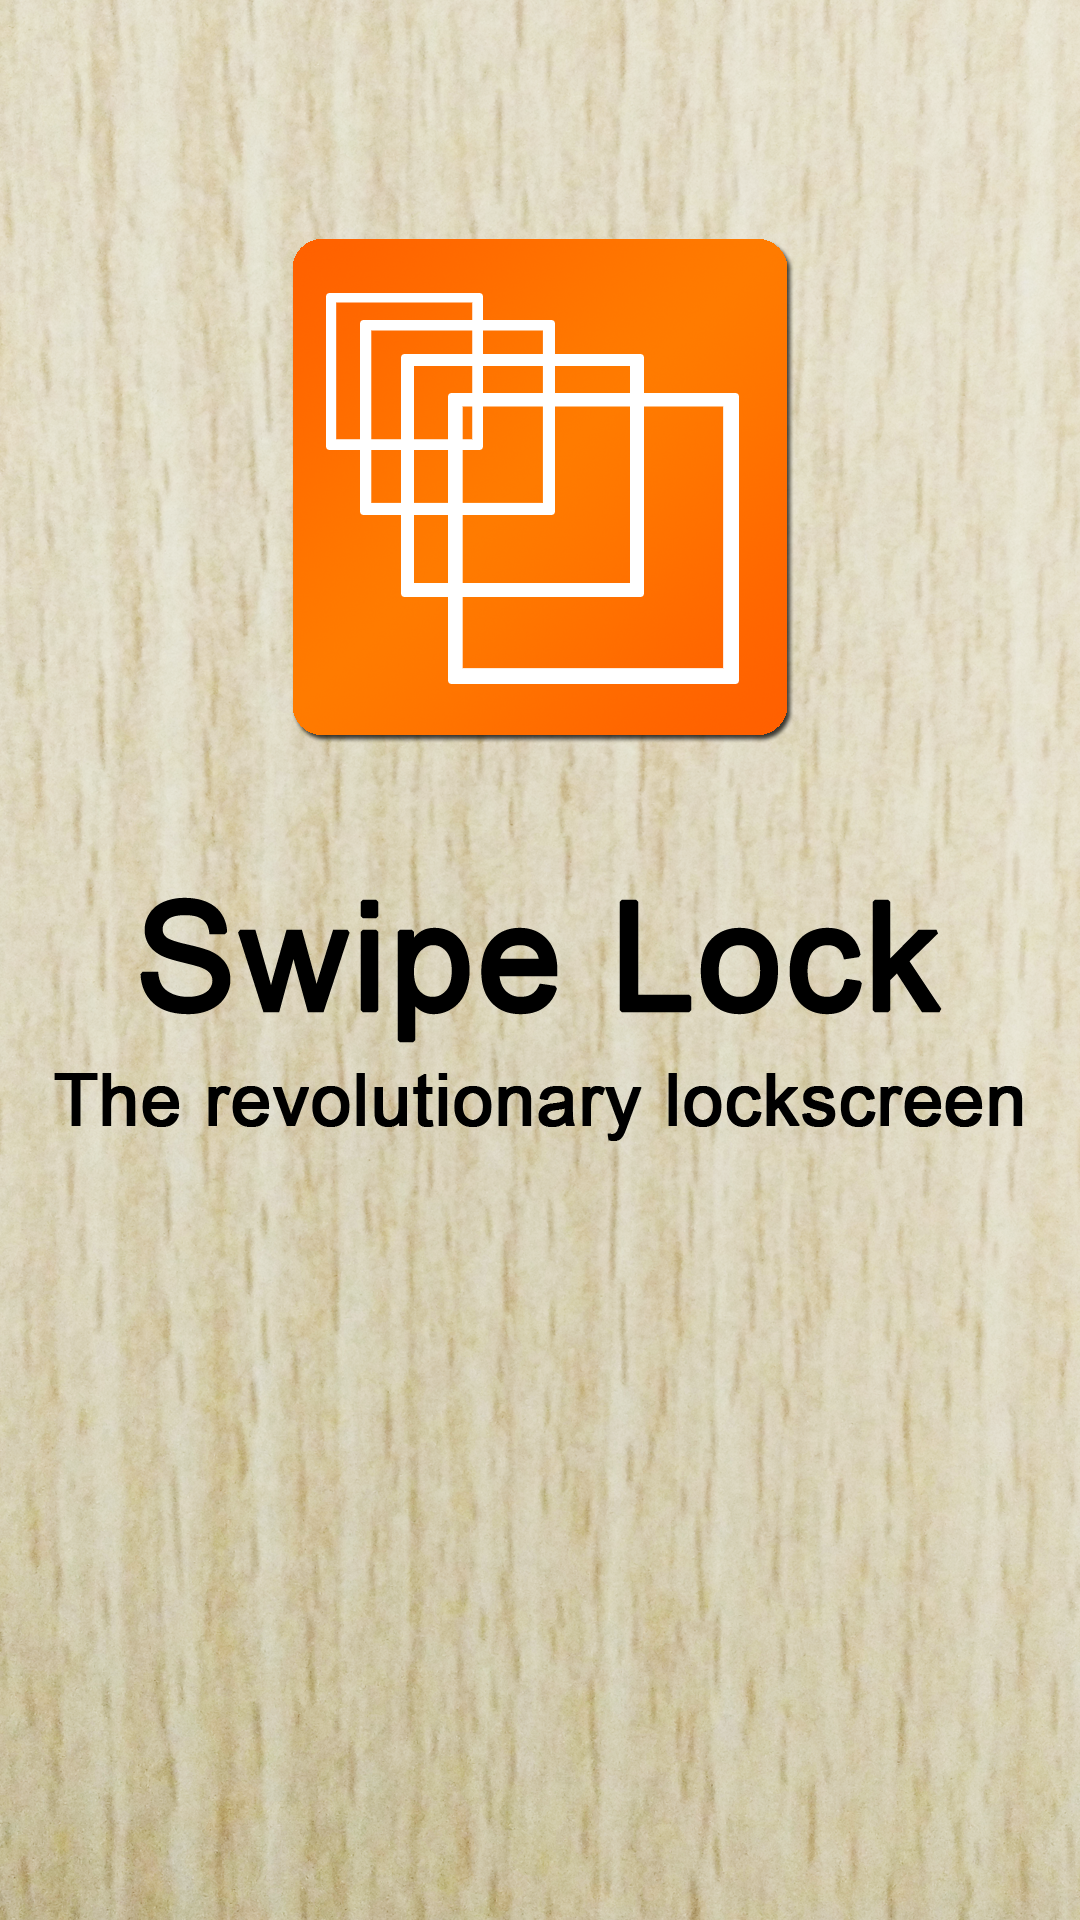 Swipe Lock